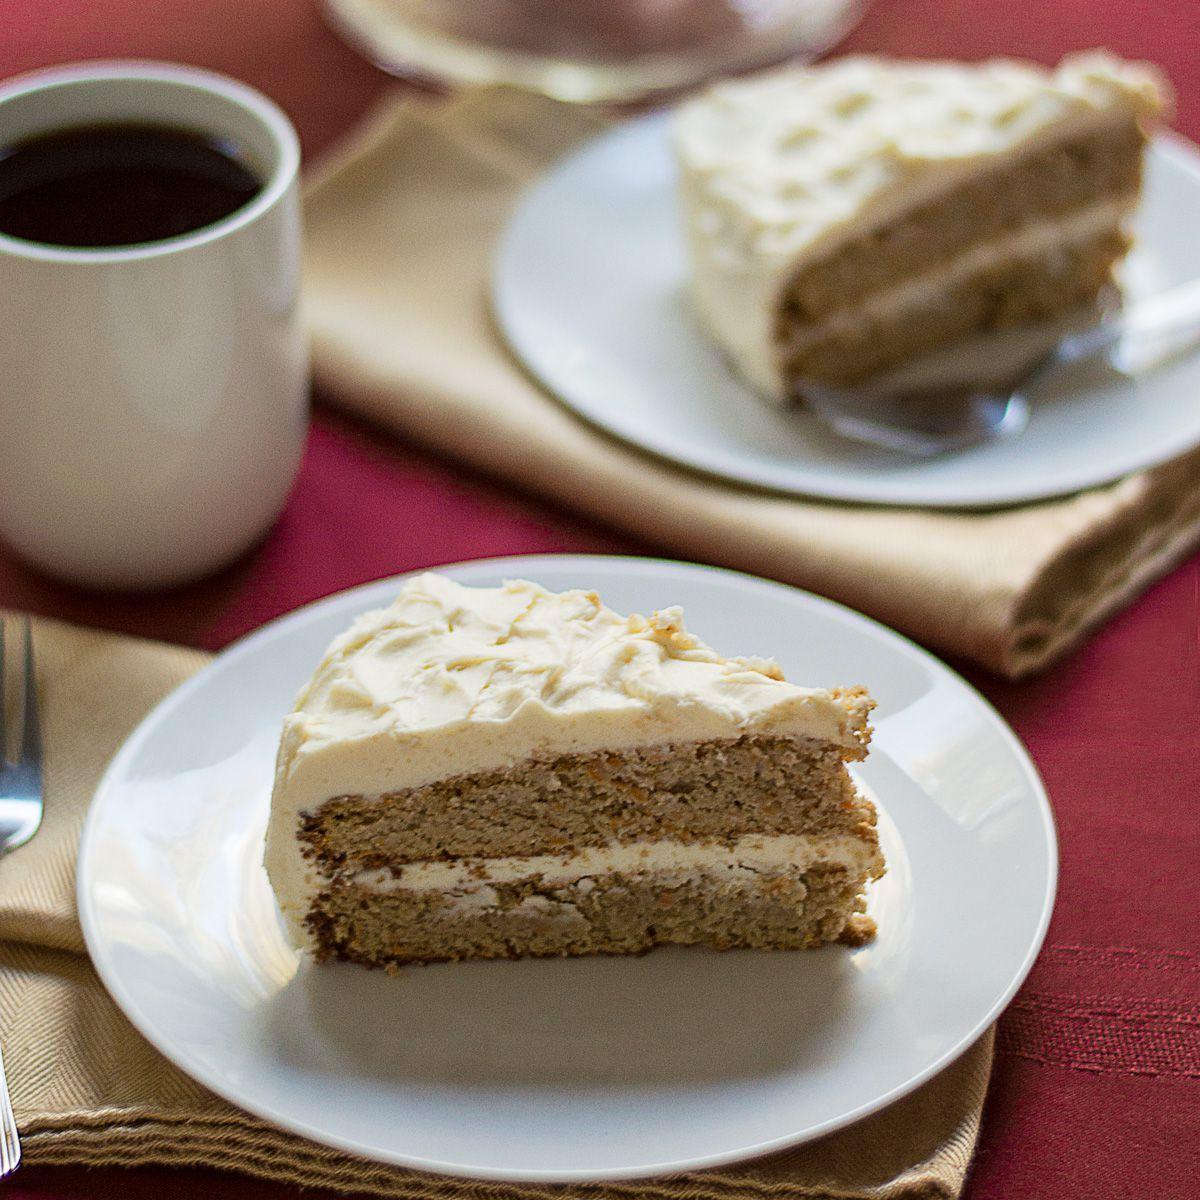 Almond flour low carb carrot cake recipe low carb